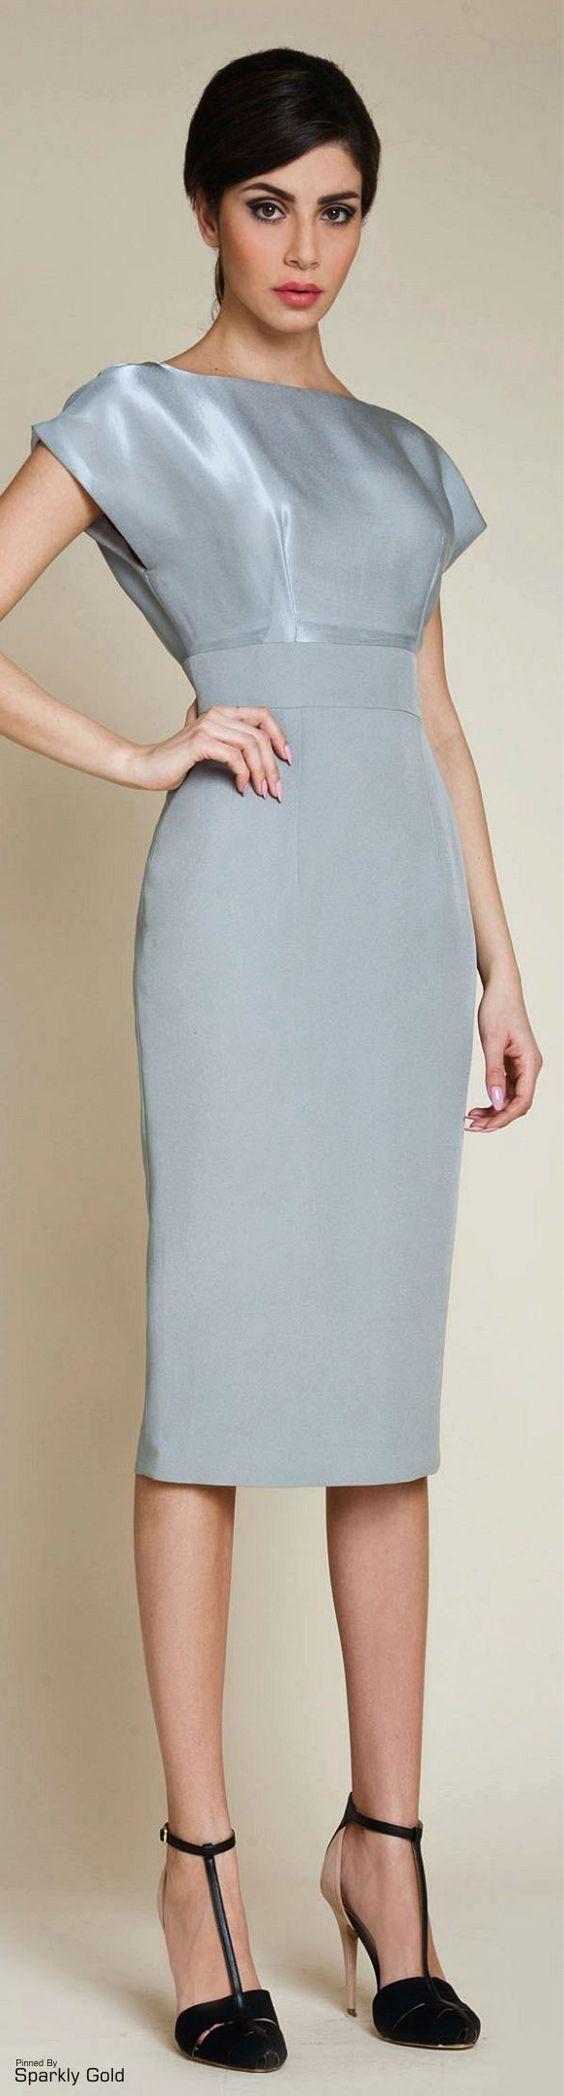 @roressclothes clothing ideas #women fashion gray silver dress